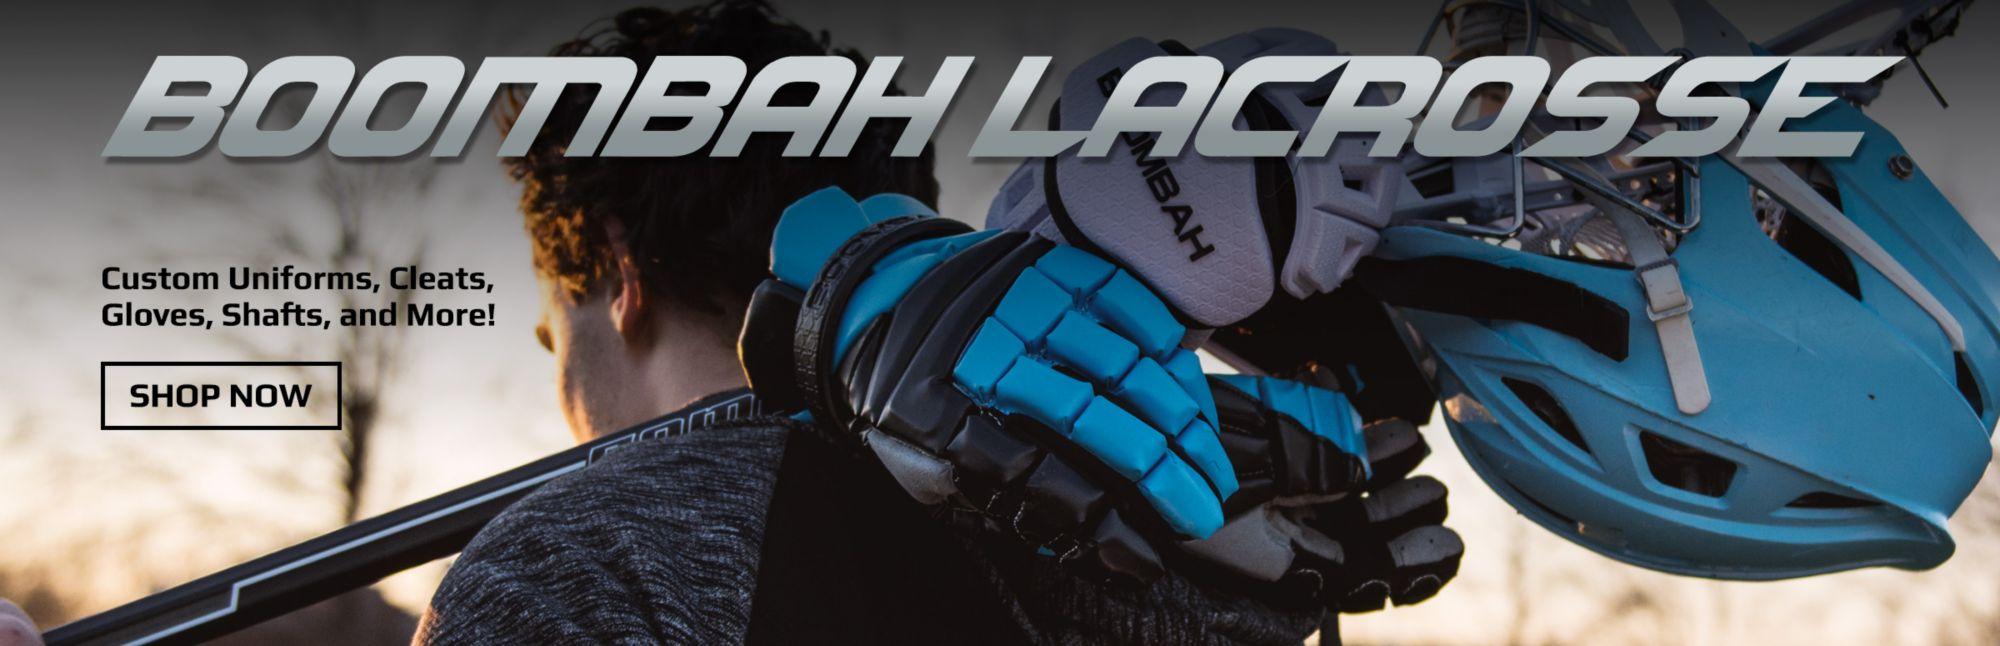 Boombah Lacrosse